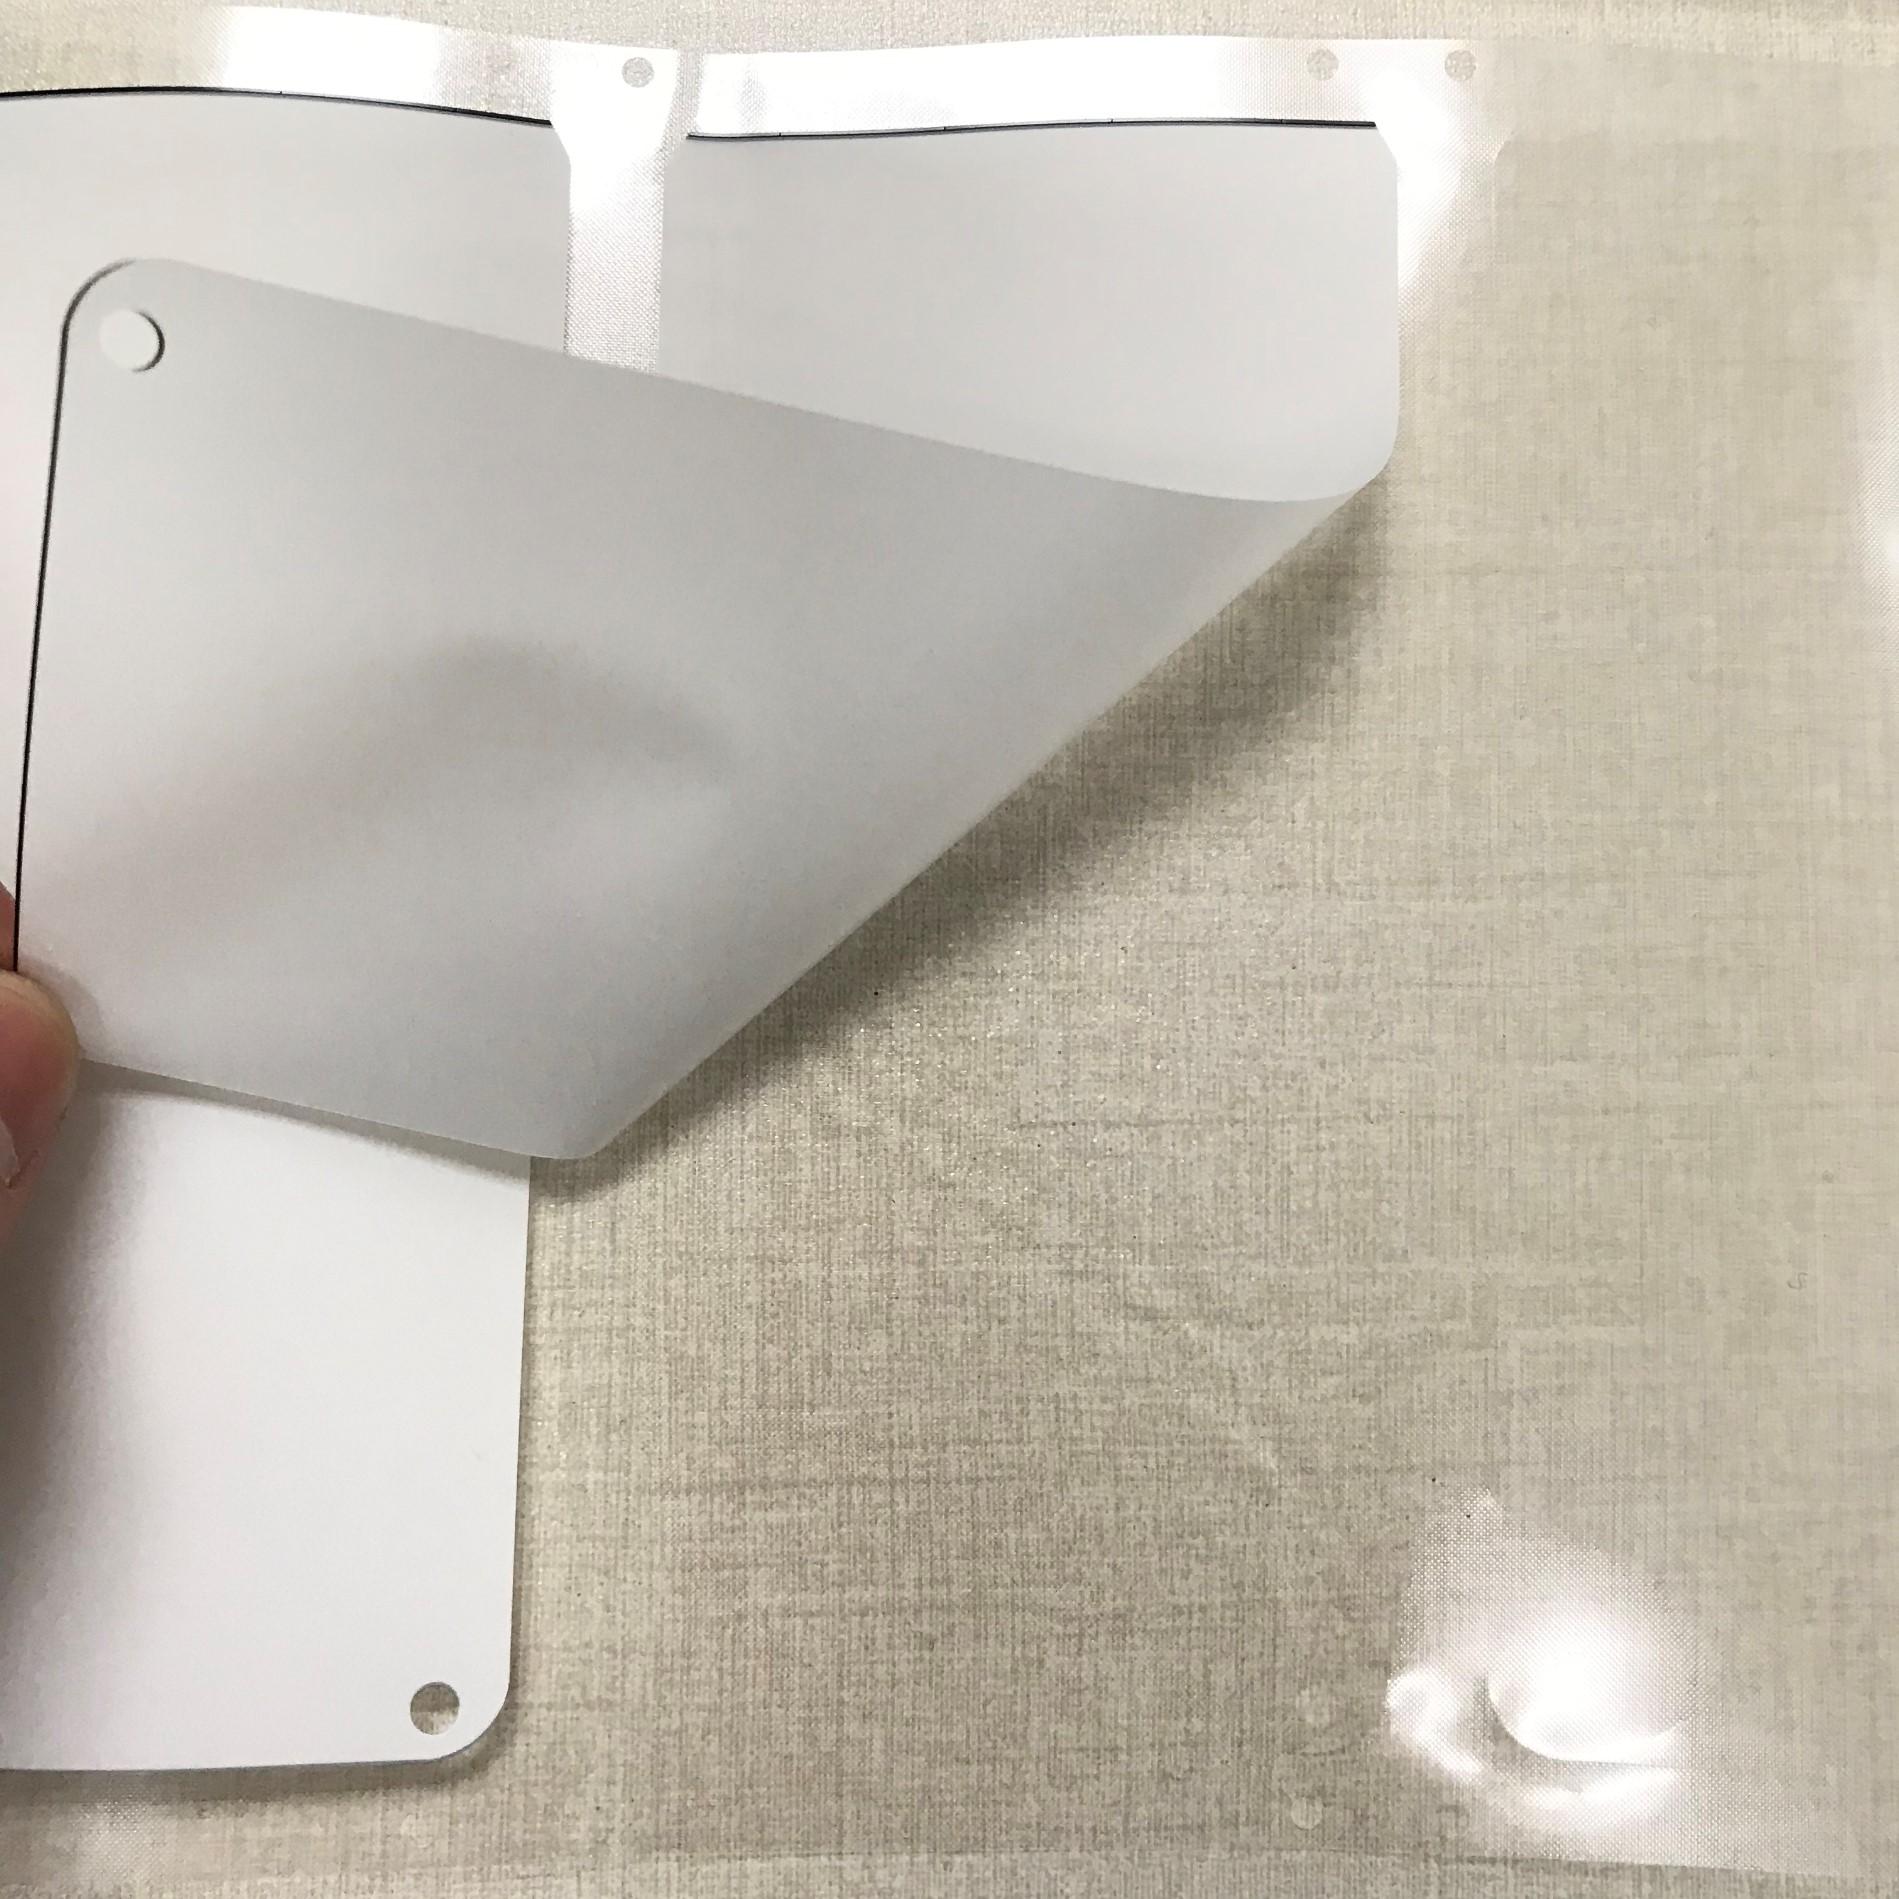 Transparent PET Acrylic Resin Diffuse Lens Film For LCD Manufacturers, Transparent PET Acrylic Resin Diffuse Lens Film For LCD Factory, Supply Transparent PET Acrylic Resin Diffuse Lens Film For LCD